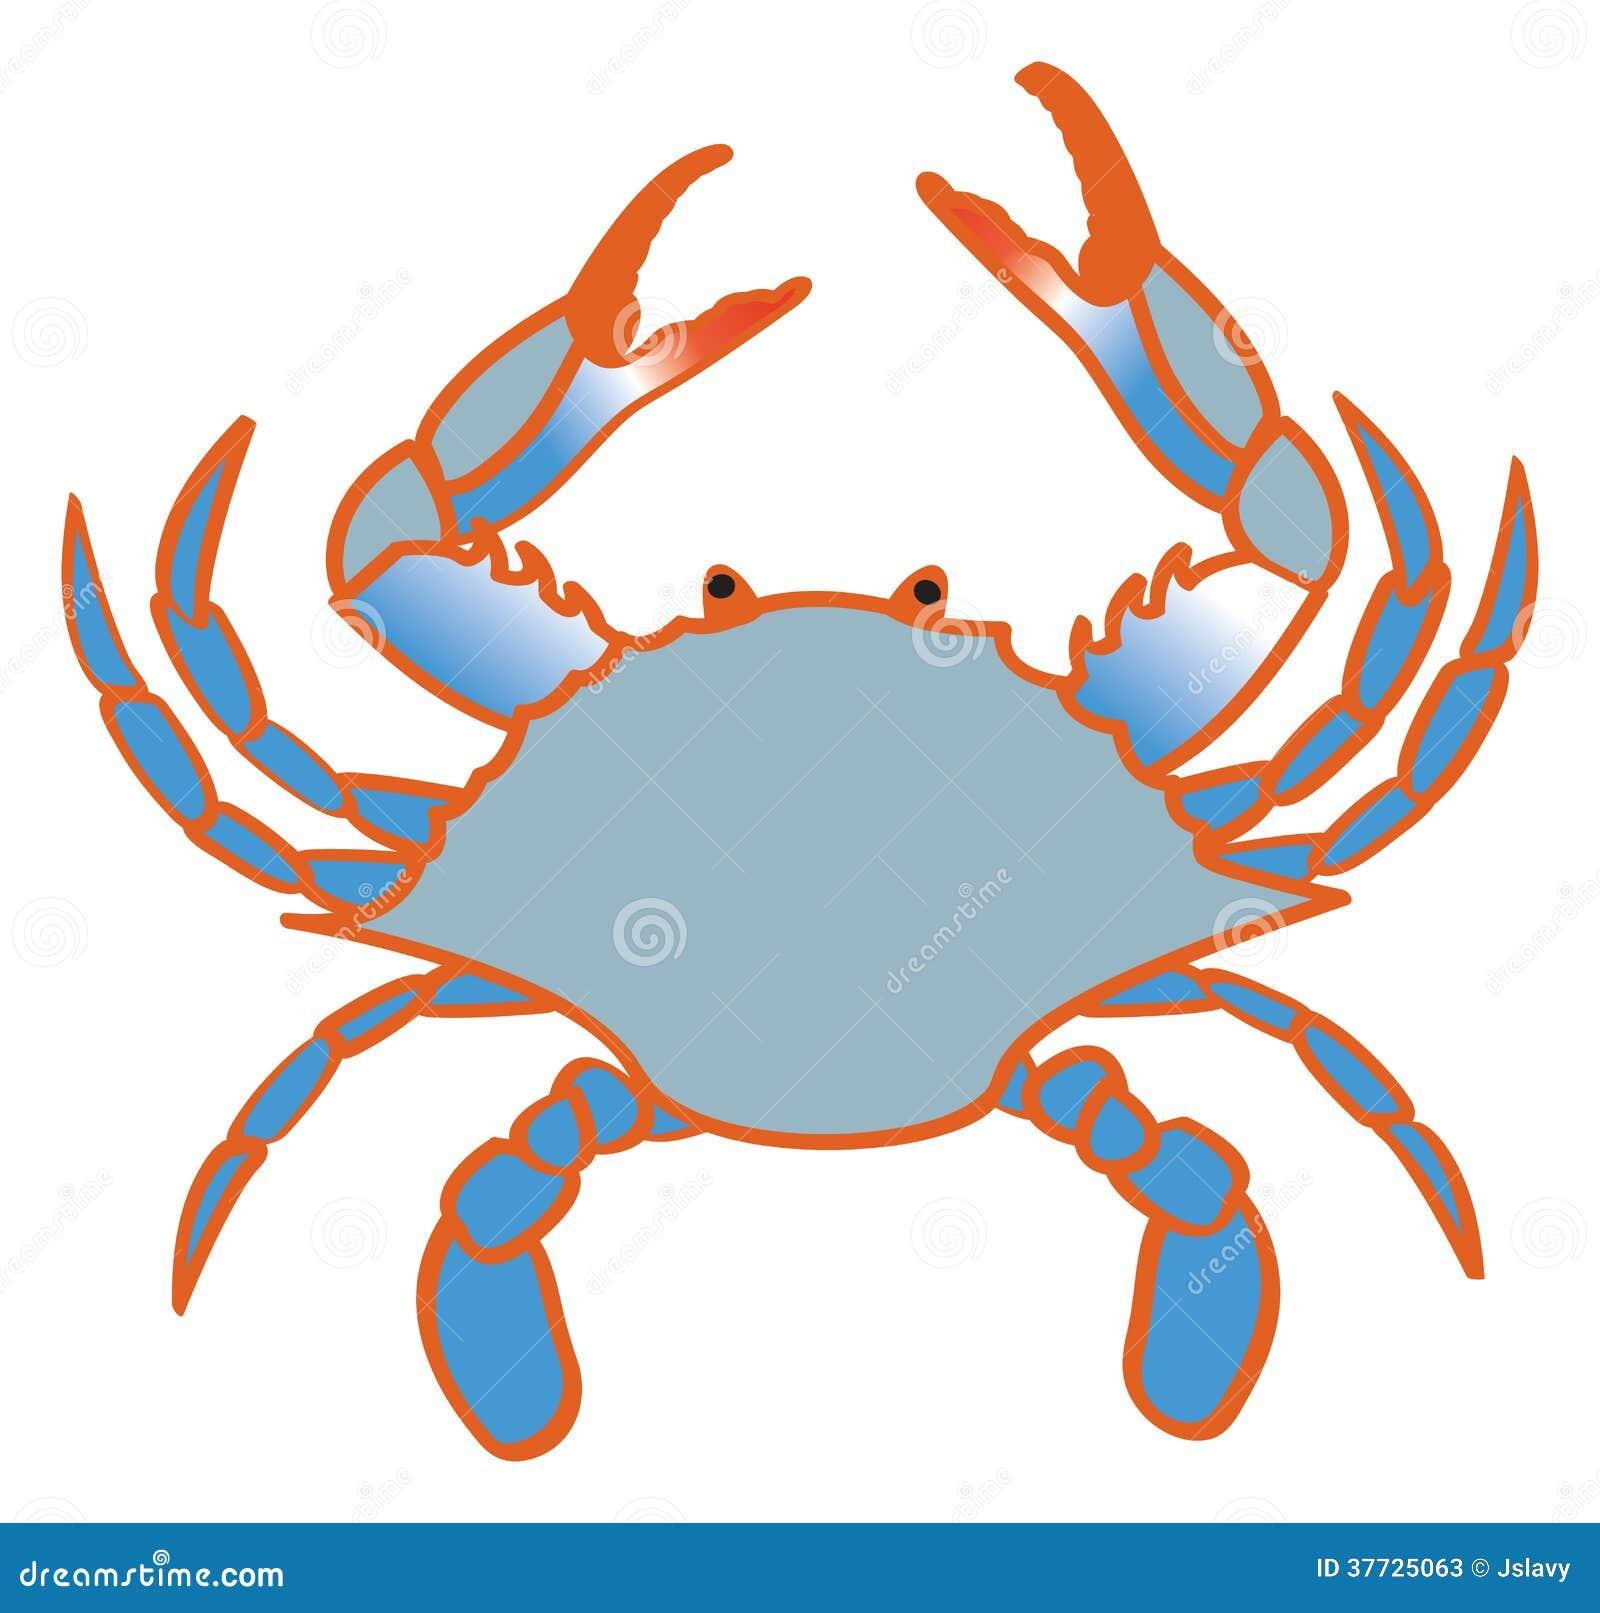 Blue Crab Stock Photos Image 37725063